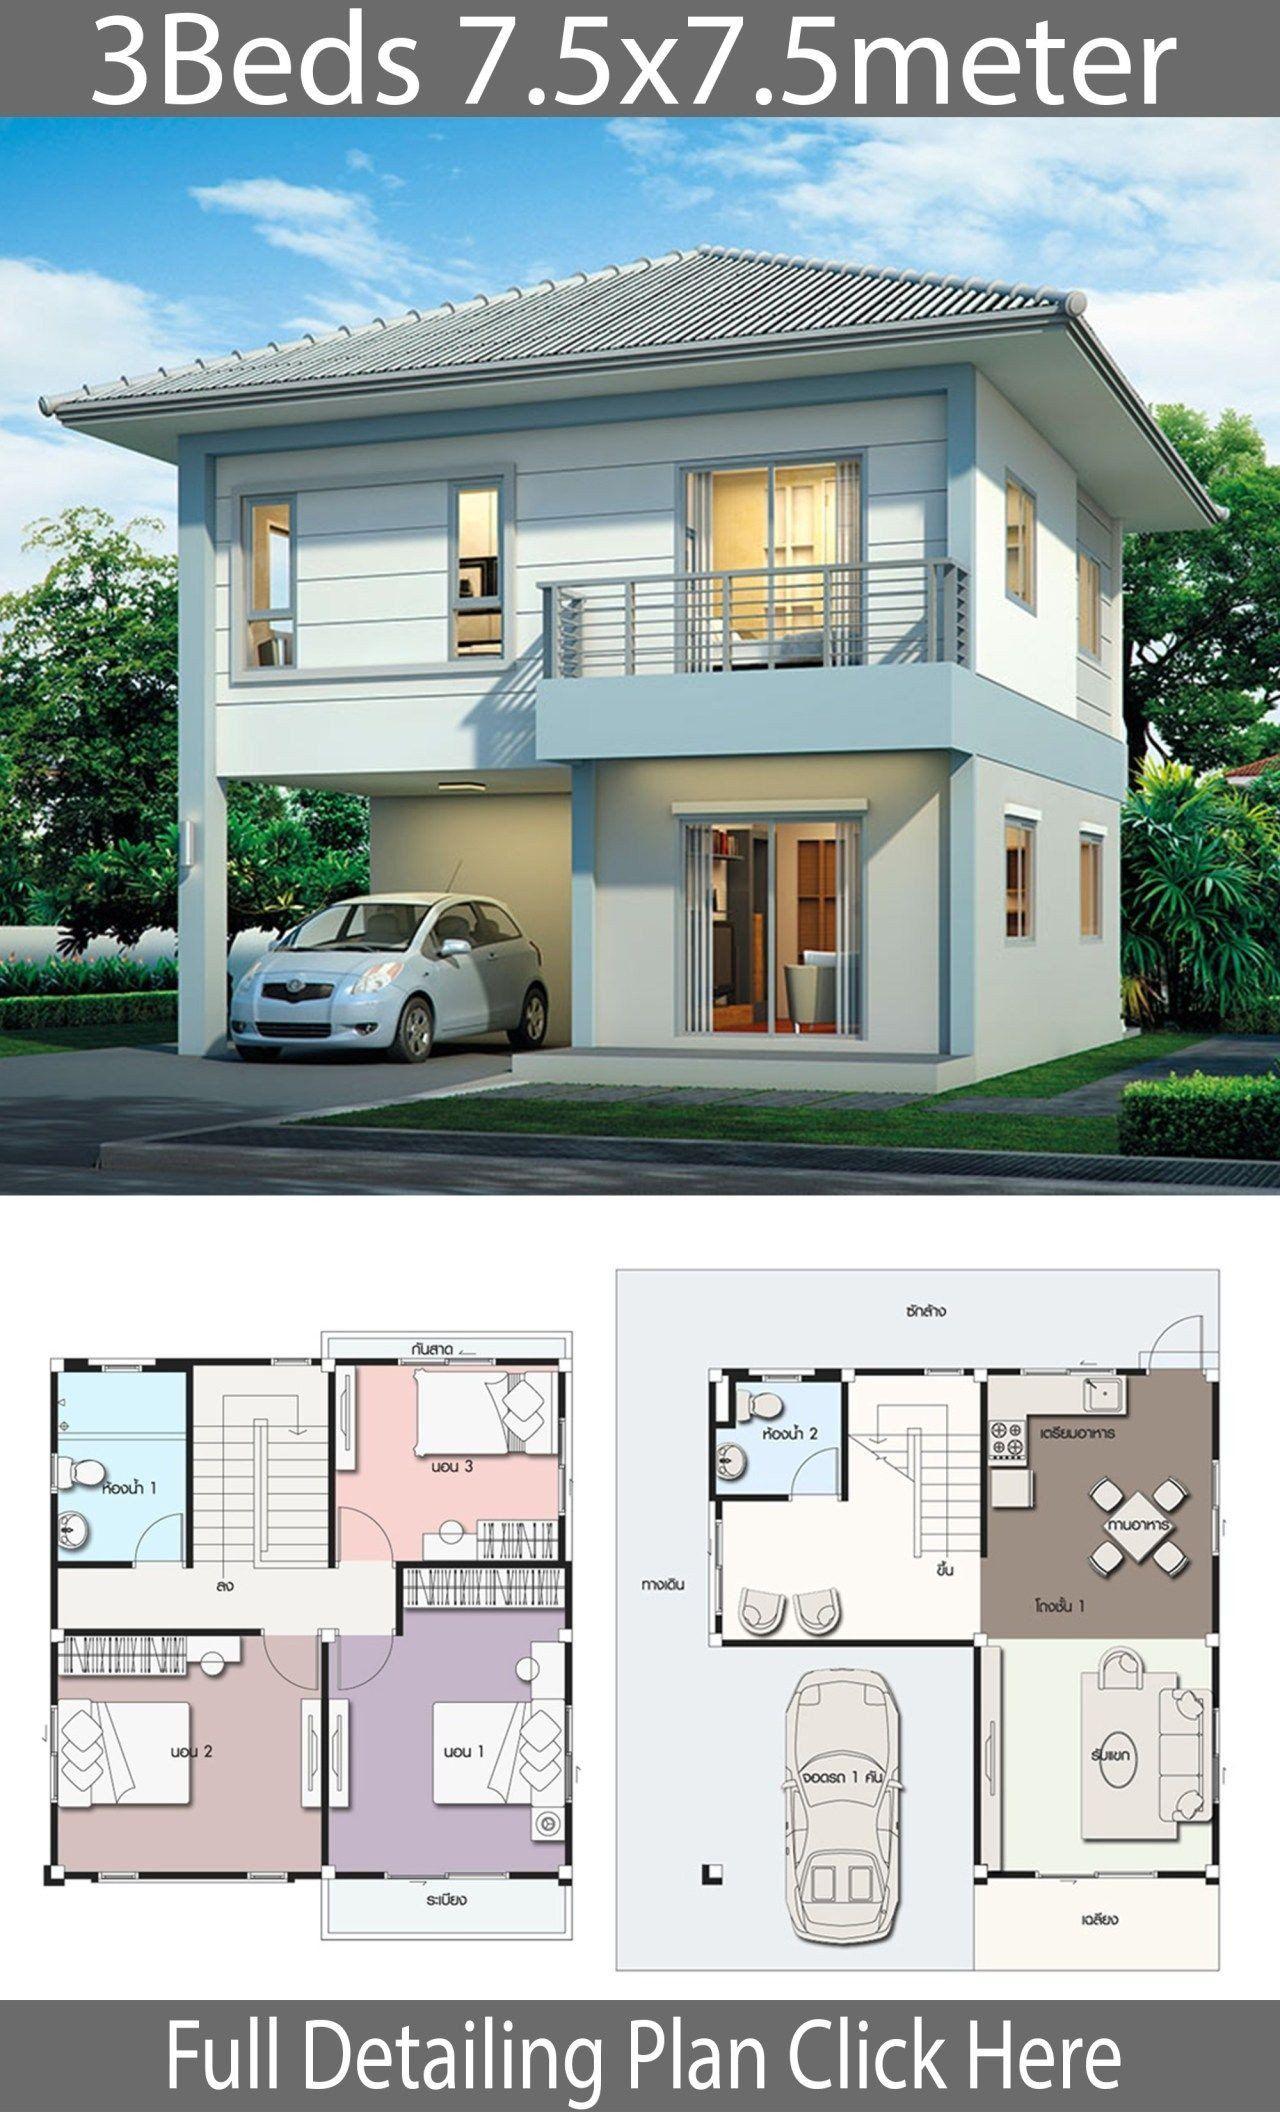 European Modern House Plans Modern House Design Plan 7 5x7 5m With 3beds Arsitektur Rumah Arsitektur Denah Lantai Rumah